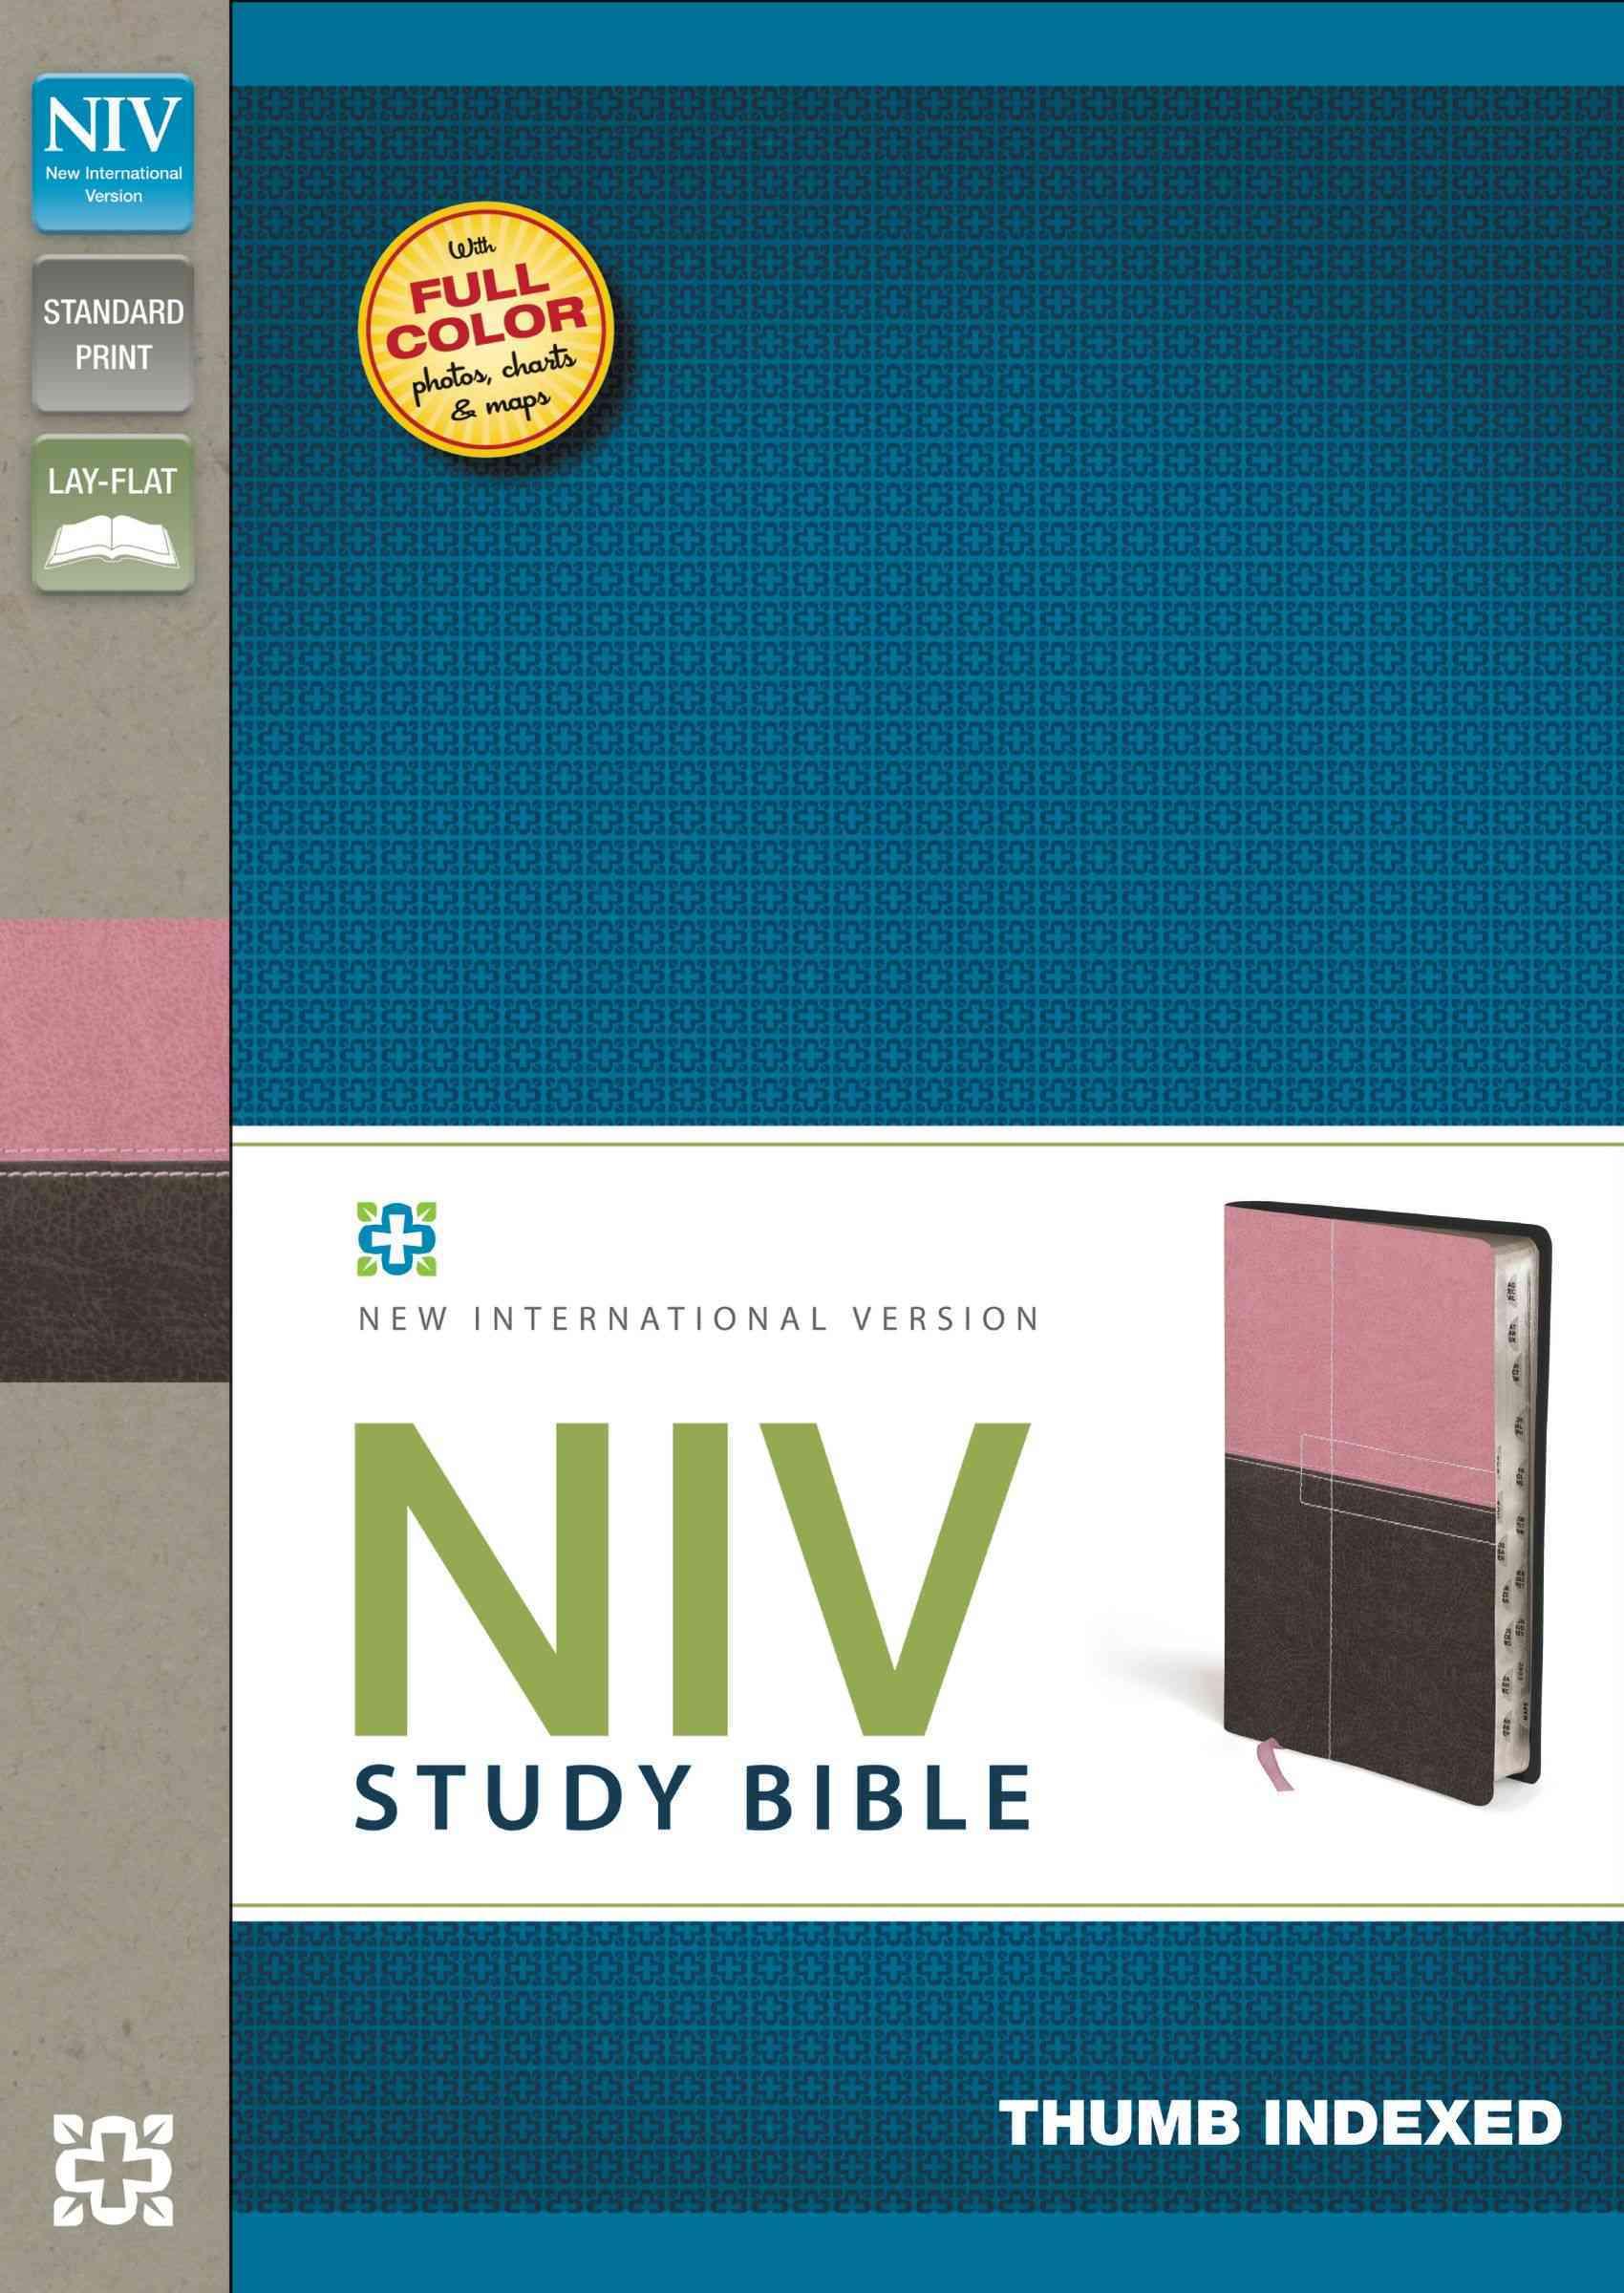 NIV Study Bible: New International Version, Berry Creme/Chocolate, Italian Duo-Tone (Paperback)